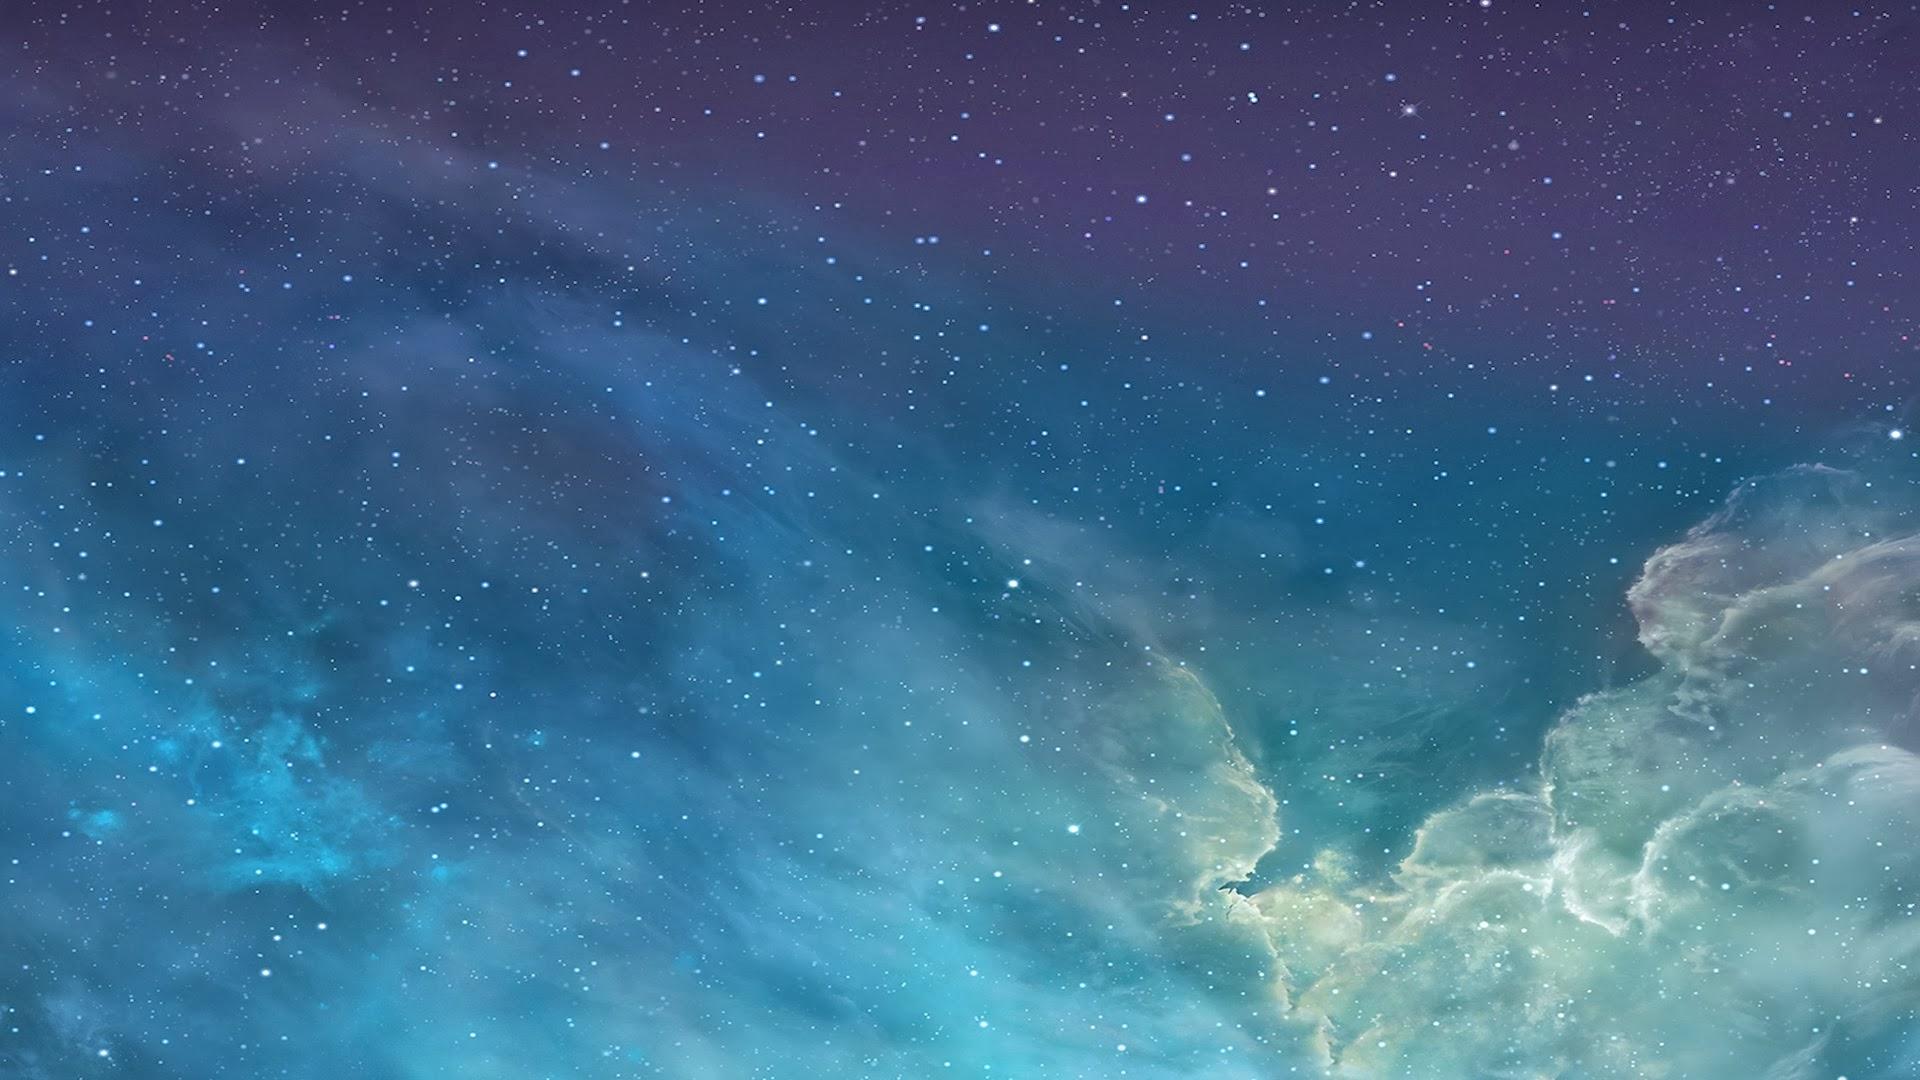 IOS 7 Galaxy Download 1920x1080